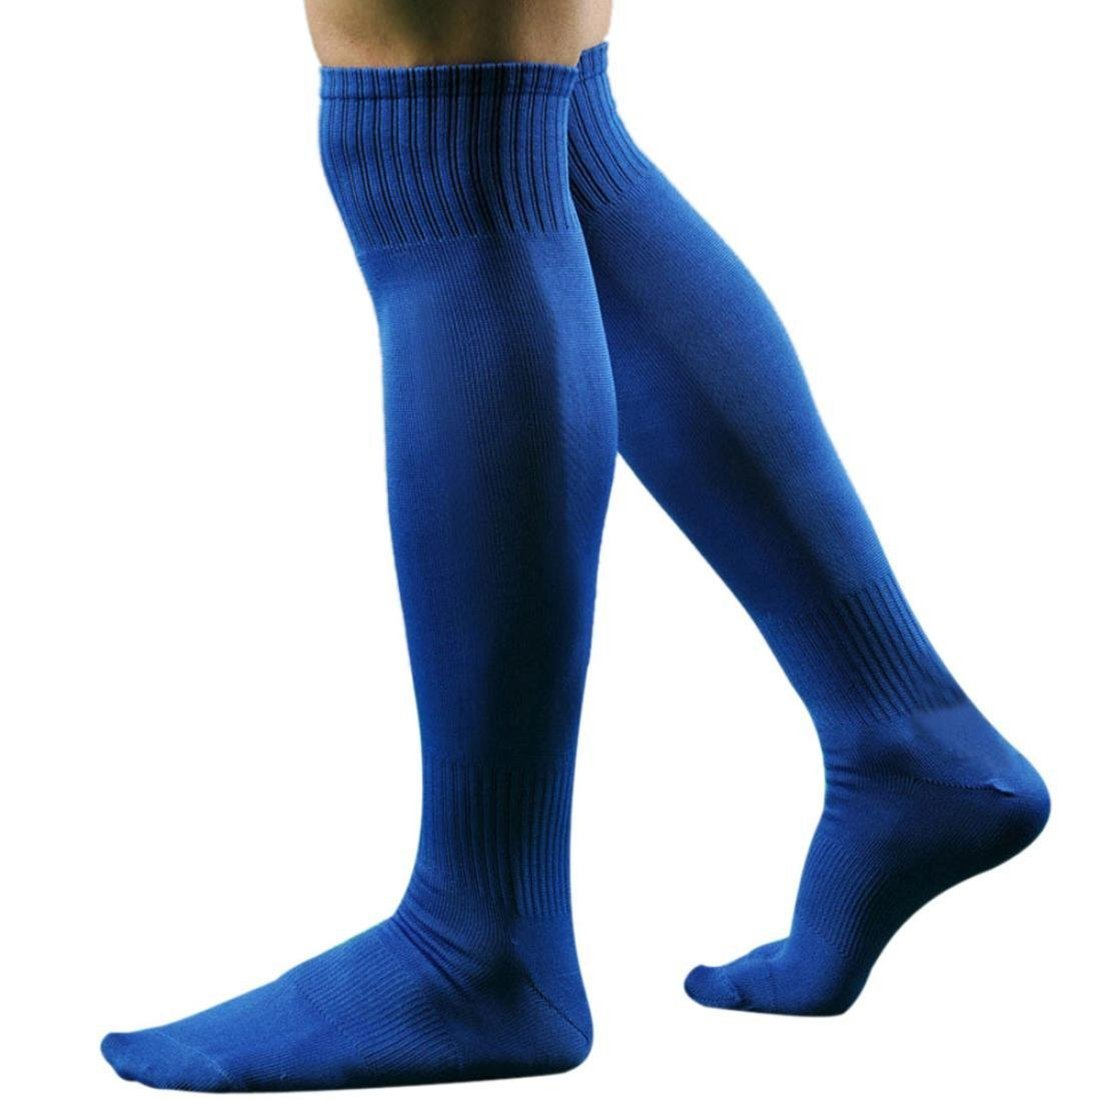 Azul WOVELOT Hombres Deportes Futbol Calcetines Largos de Alta calcetin Beisbol Hockey